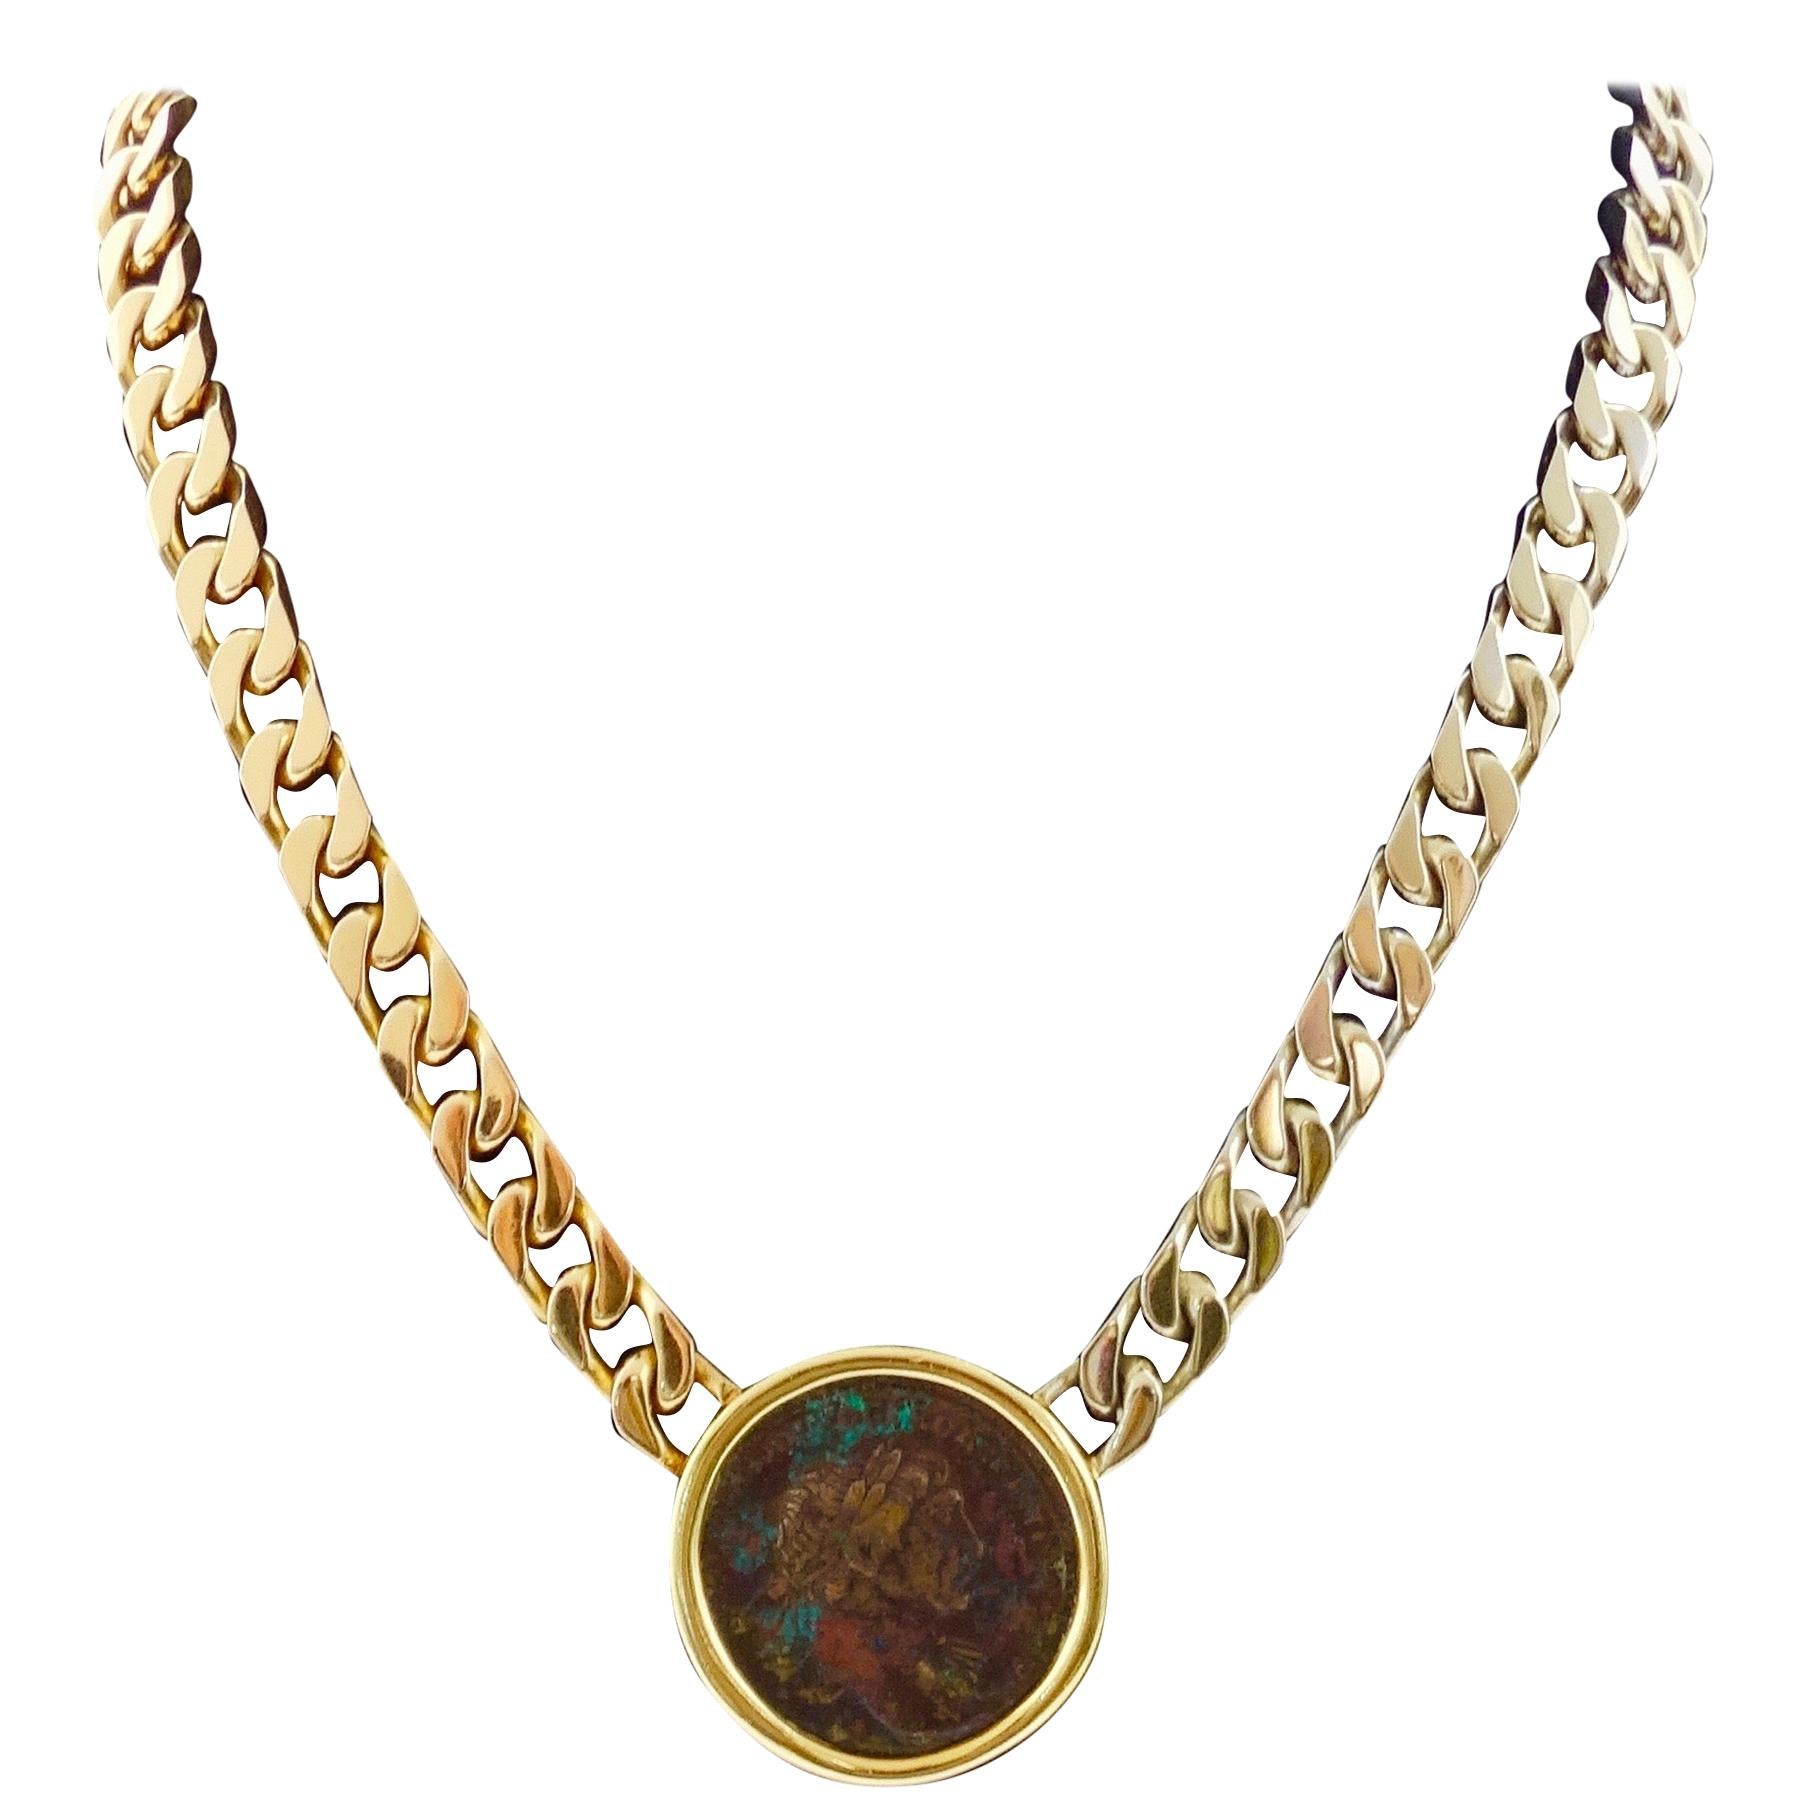 Bulgari Bulgari Necklace